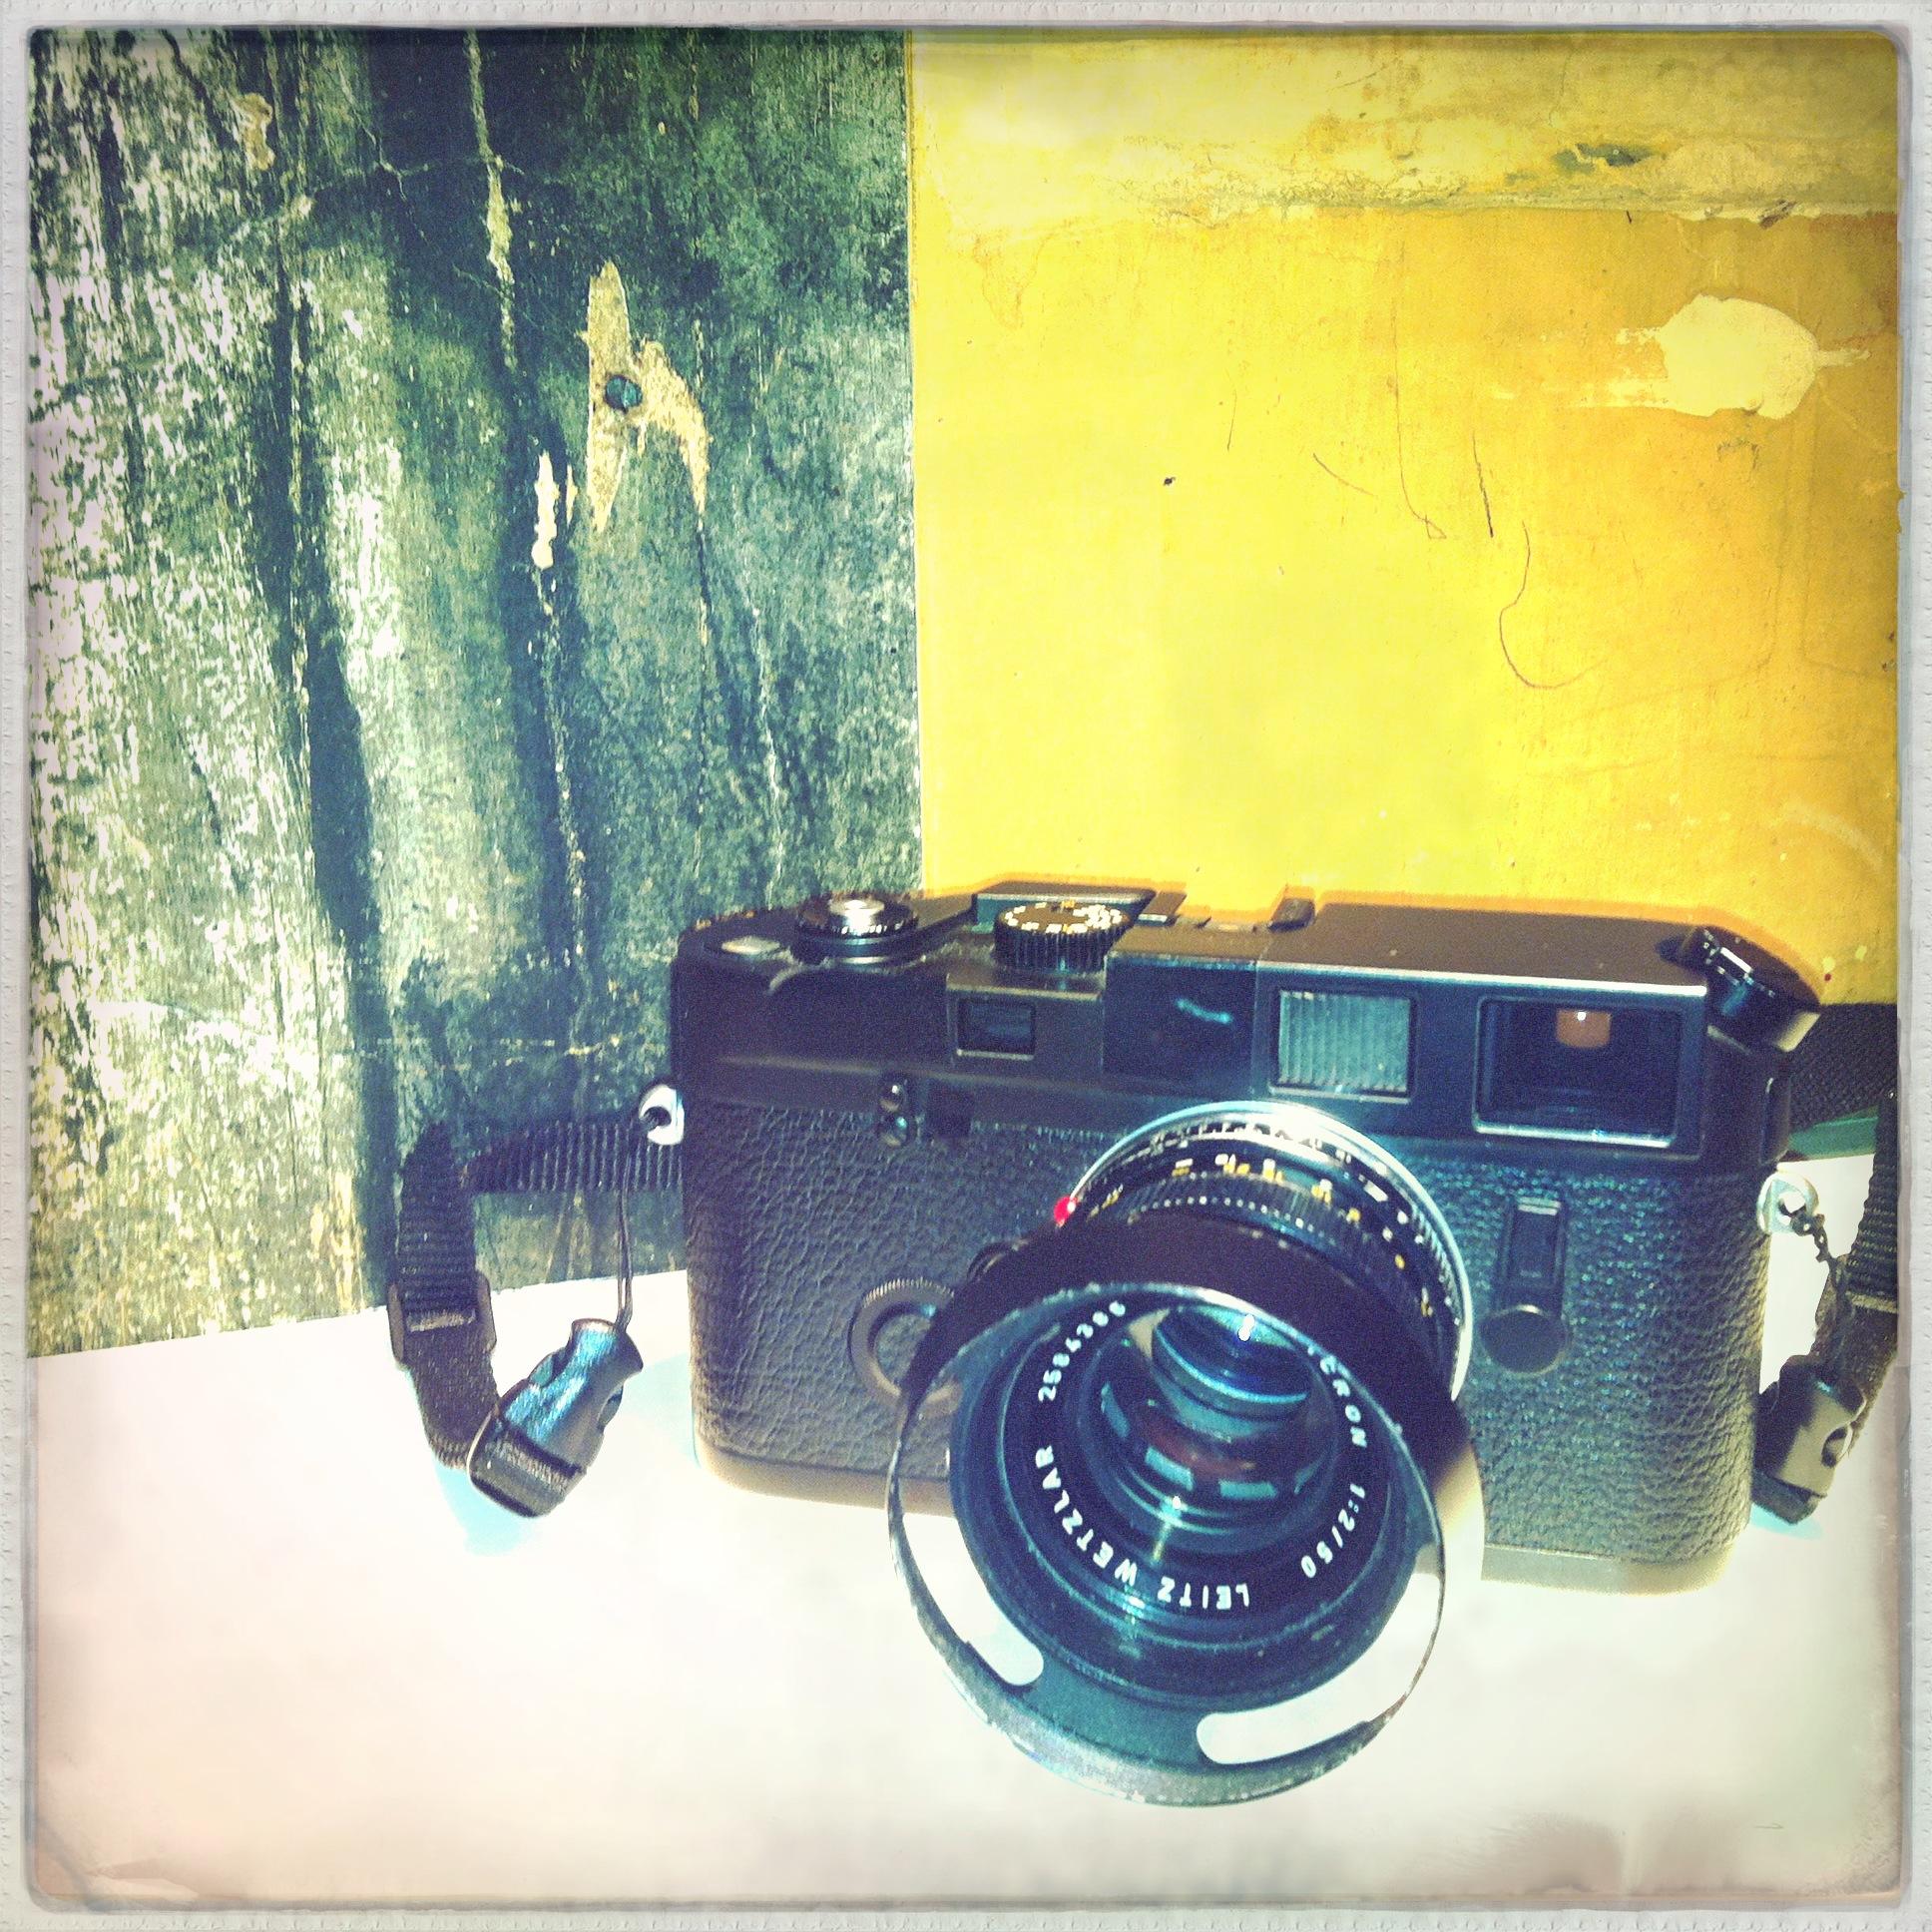 Leica M6 with 50 f/2 Summicron